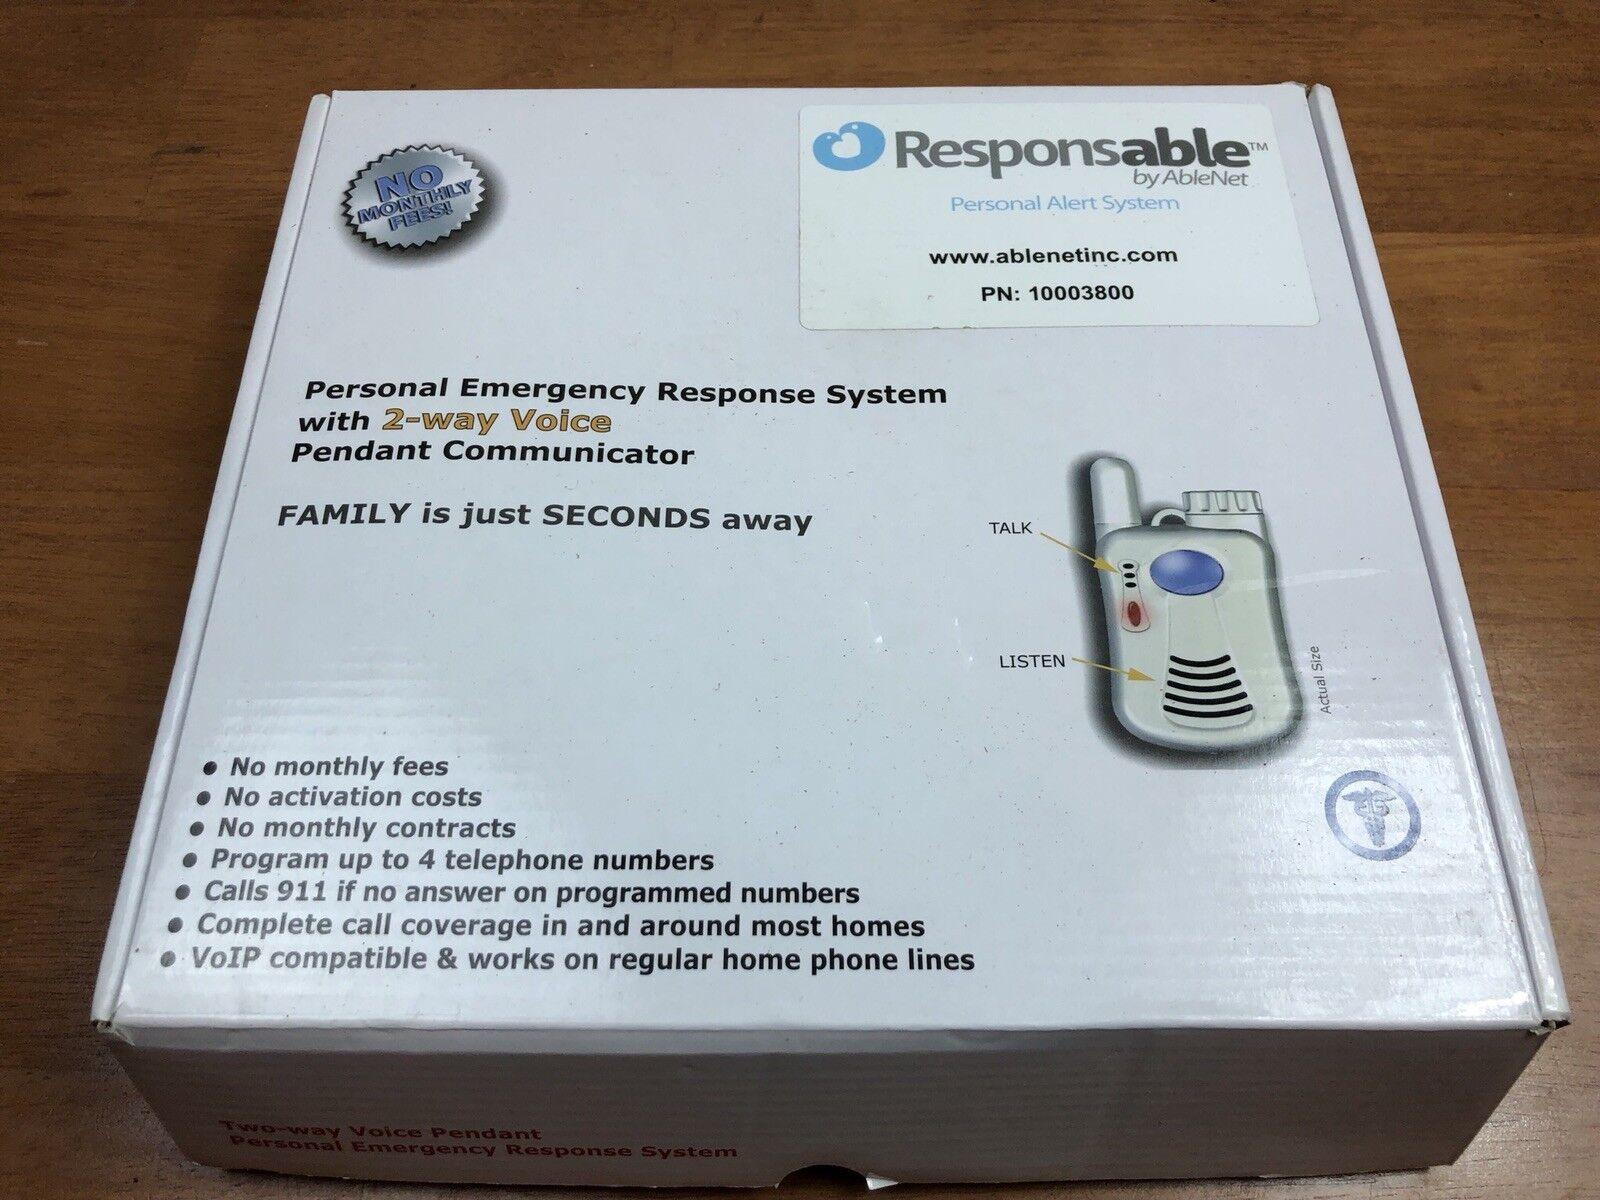 AbleNet 10003800 Responsible Responsable Personal Alert System